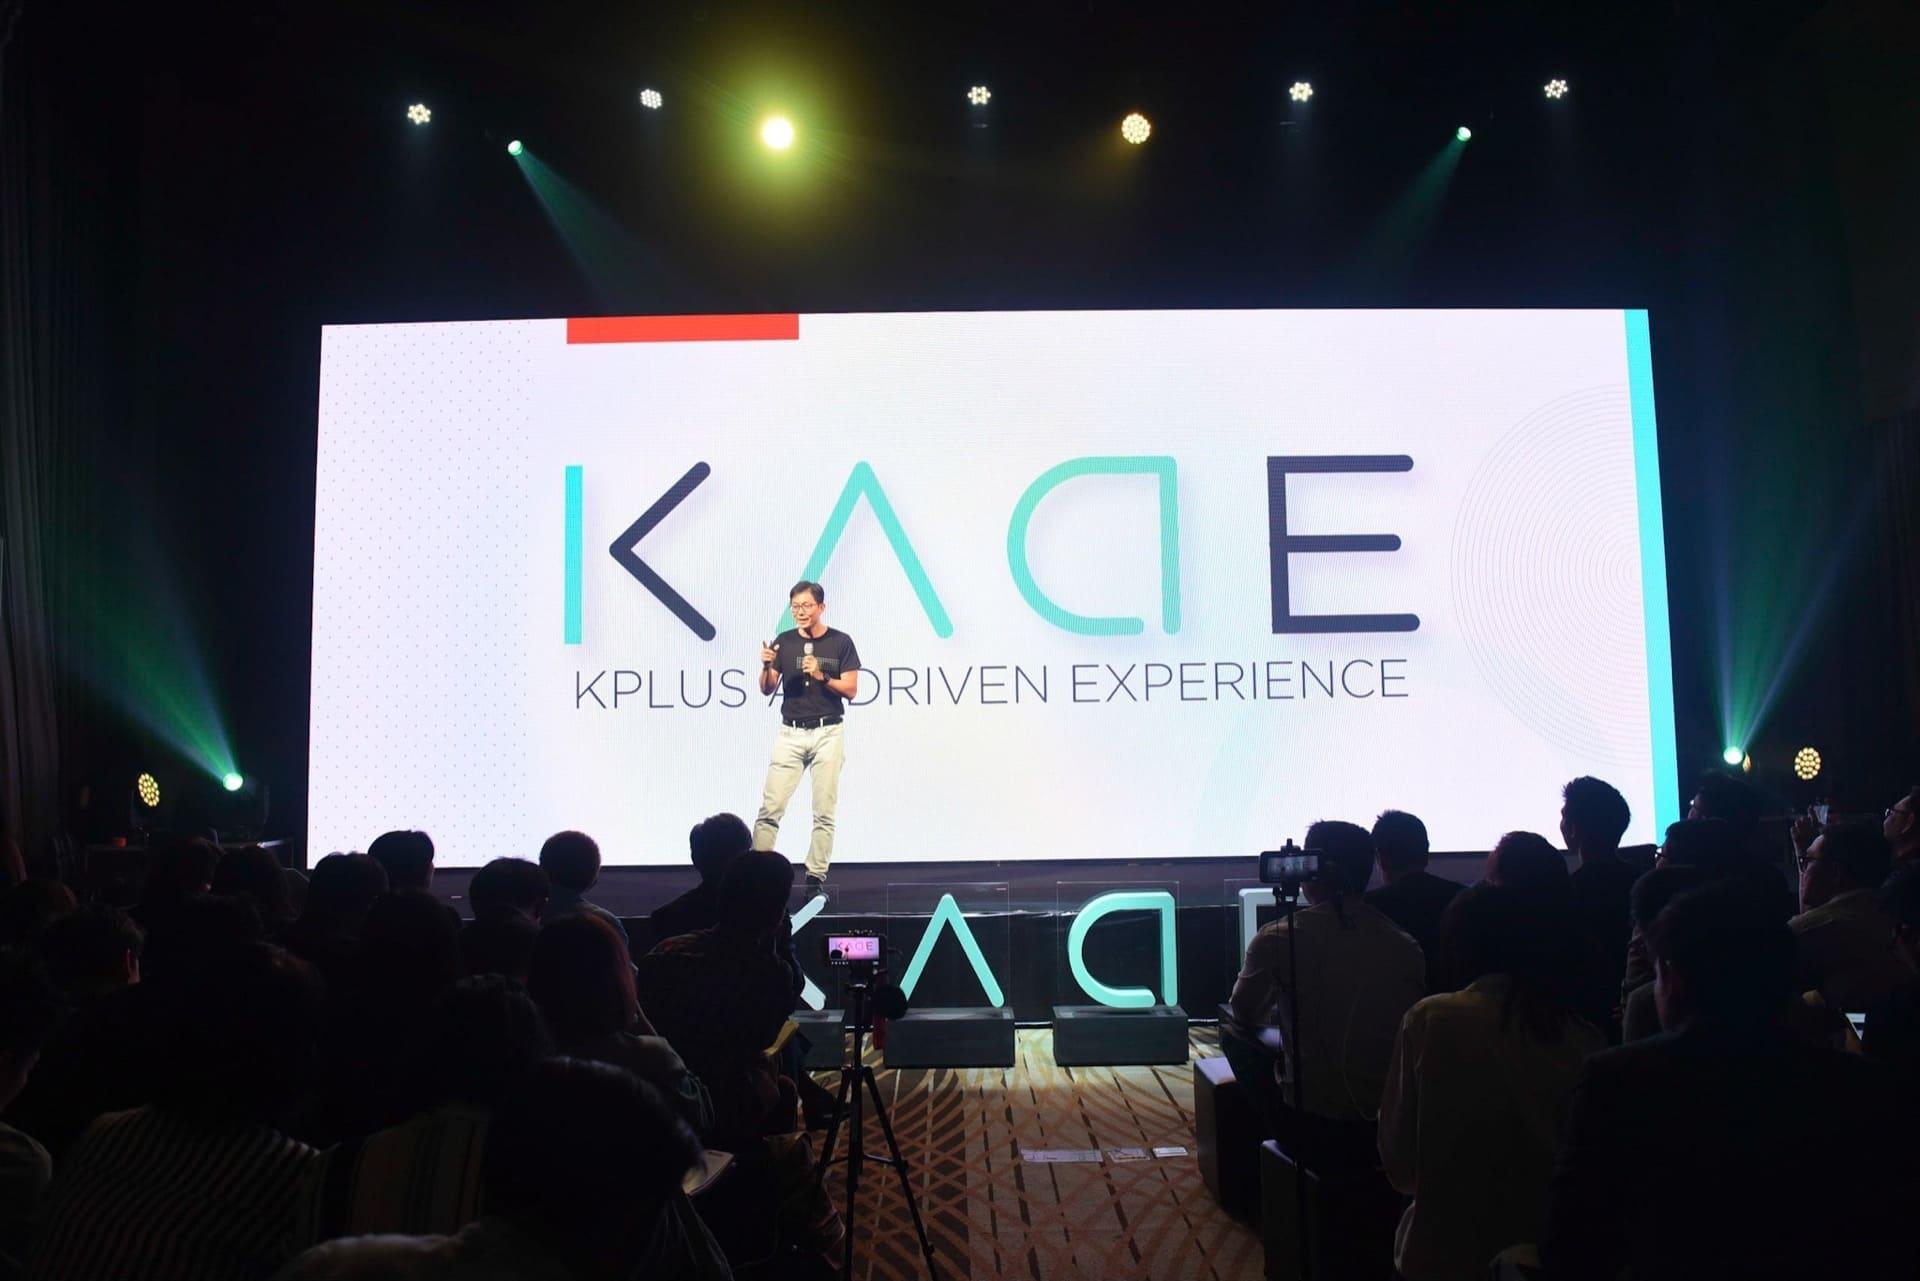 KADE - K Plus AI-Driven Experience